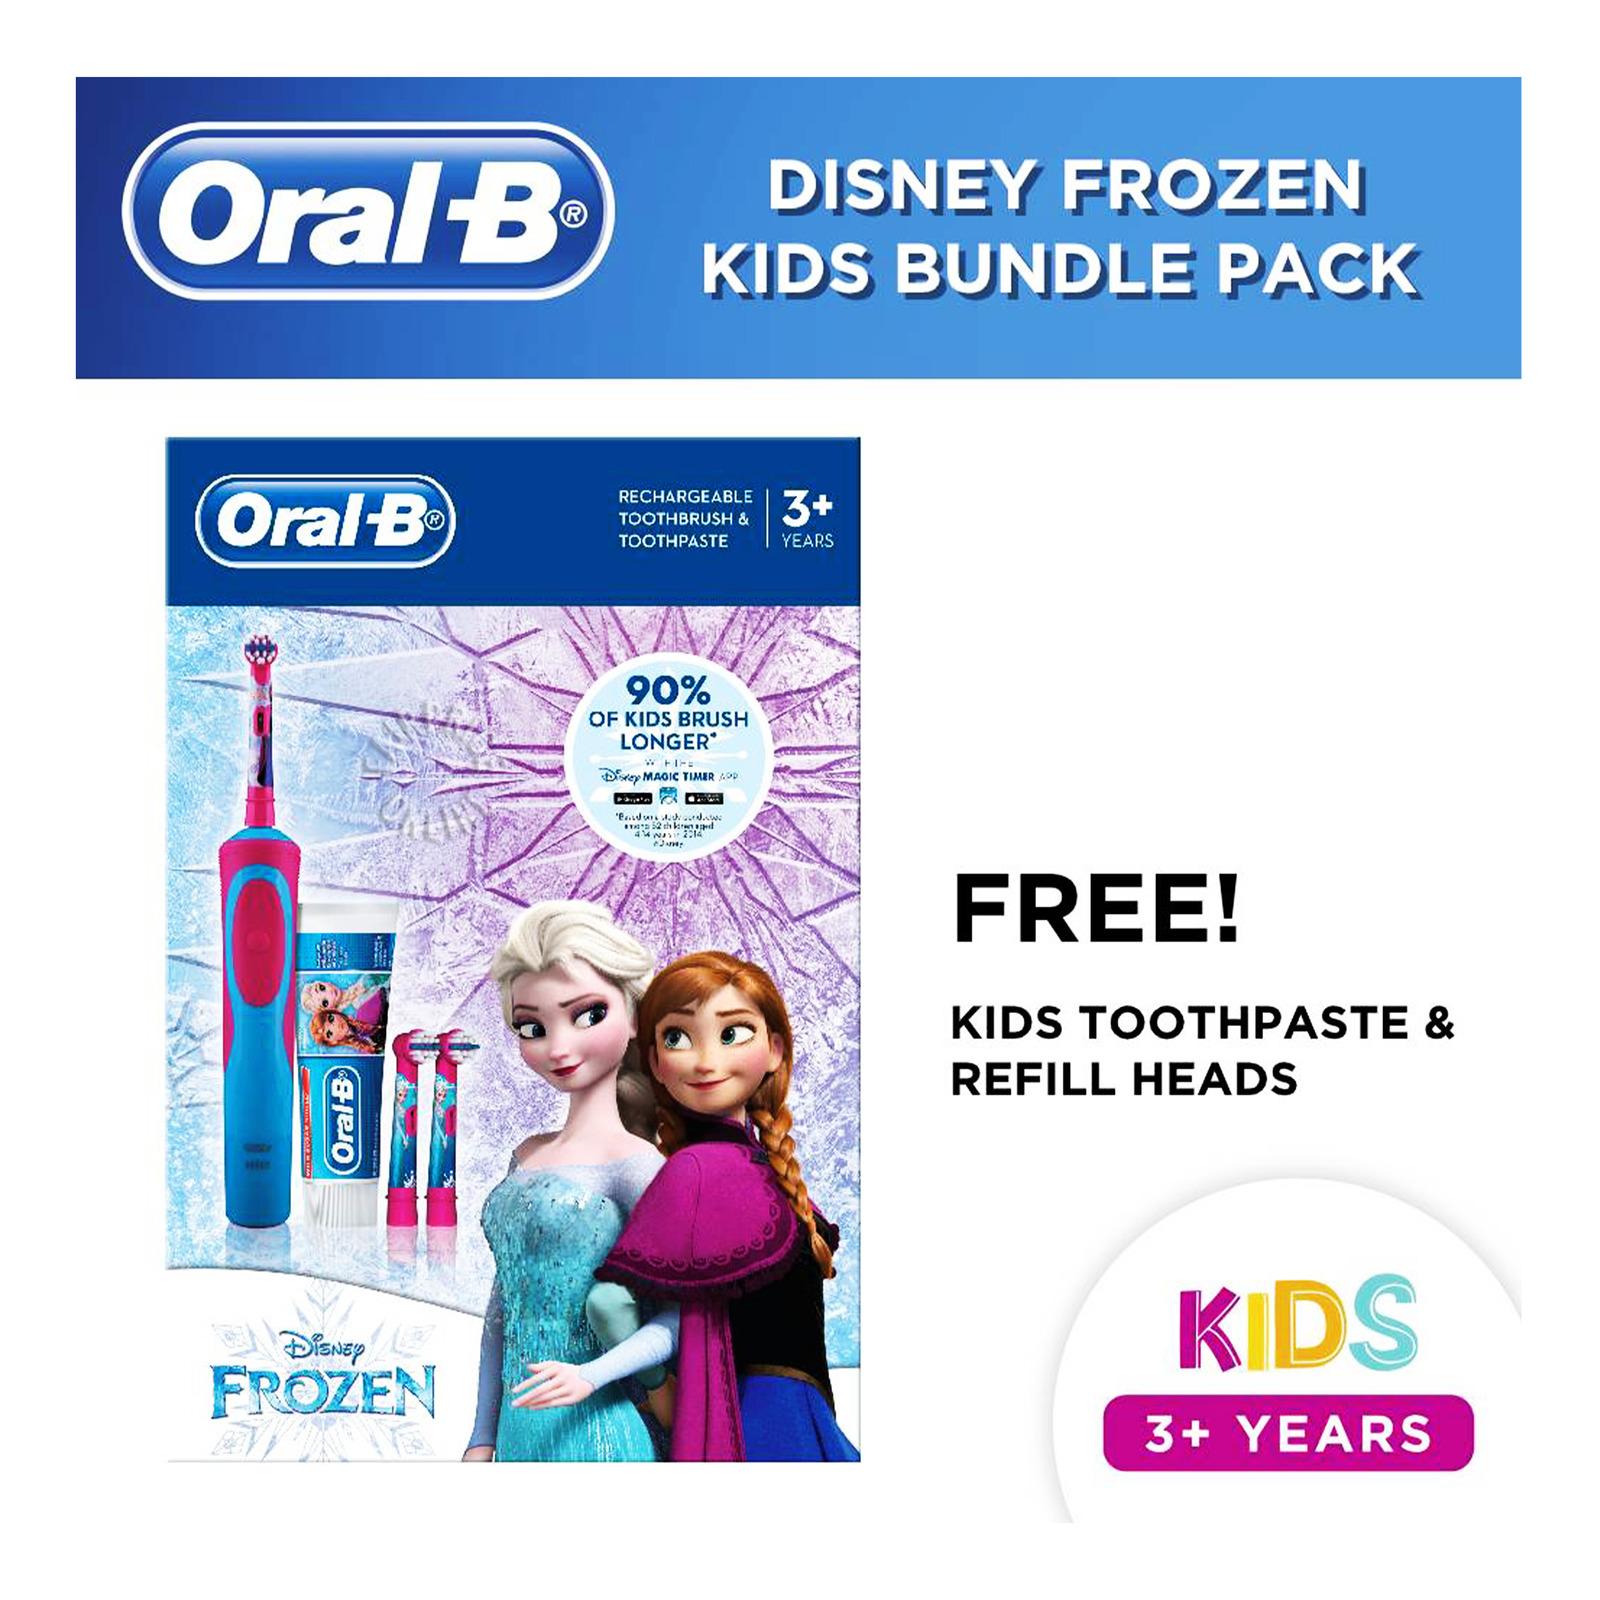 Oral-B Kids Bundle Pack - Disney Frozen